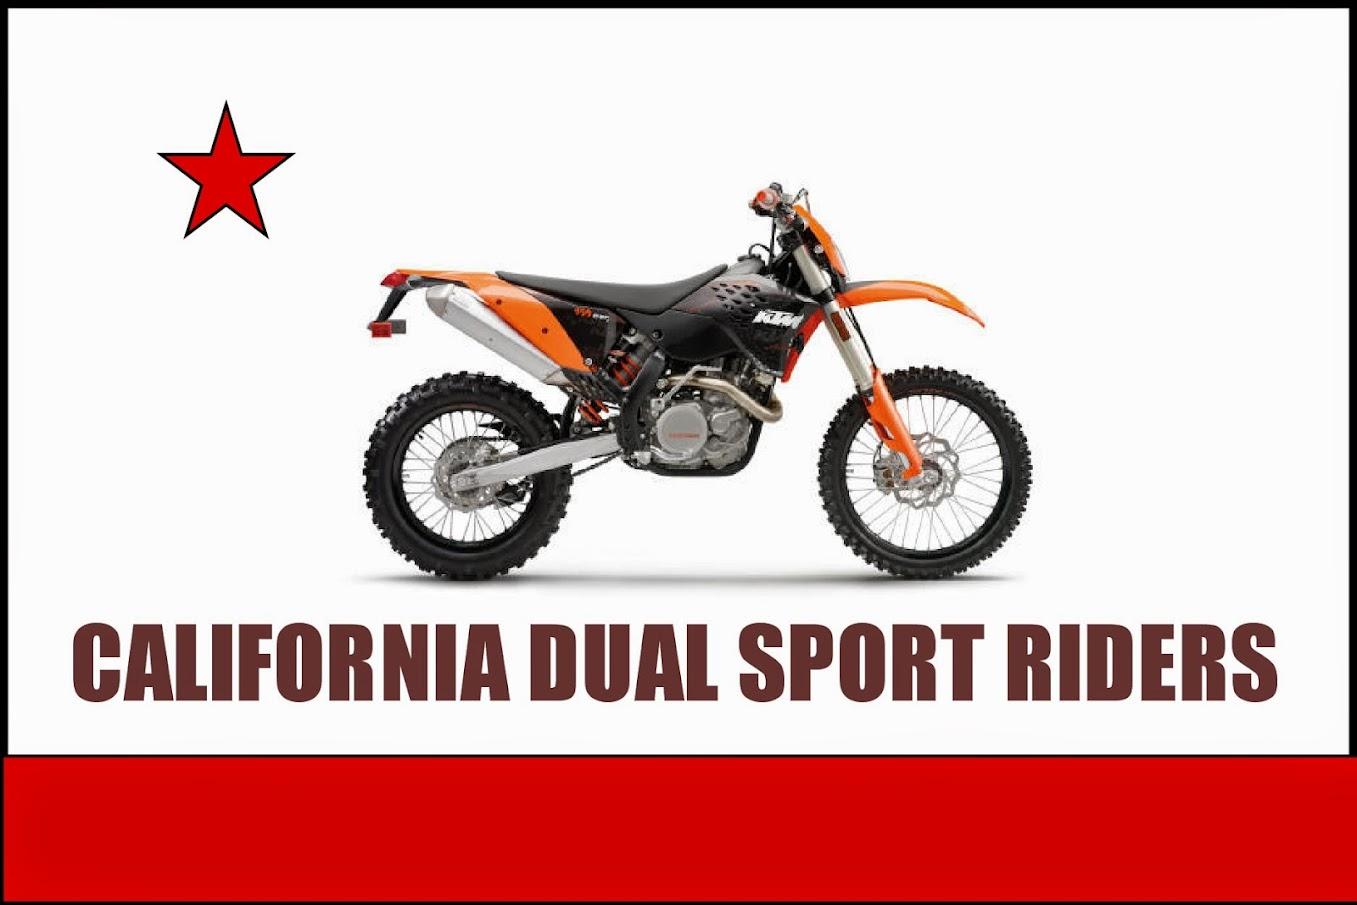 http://www.meetup.com/California-Dual-Sport-Riders/